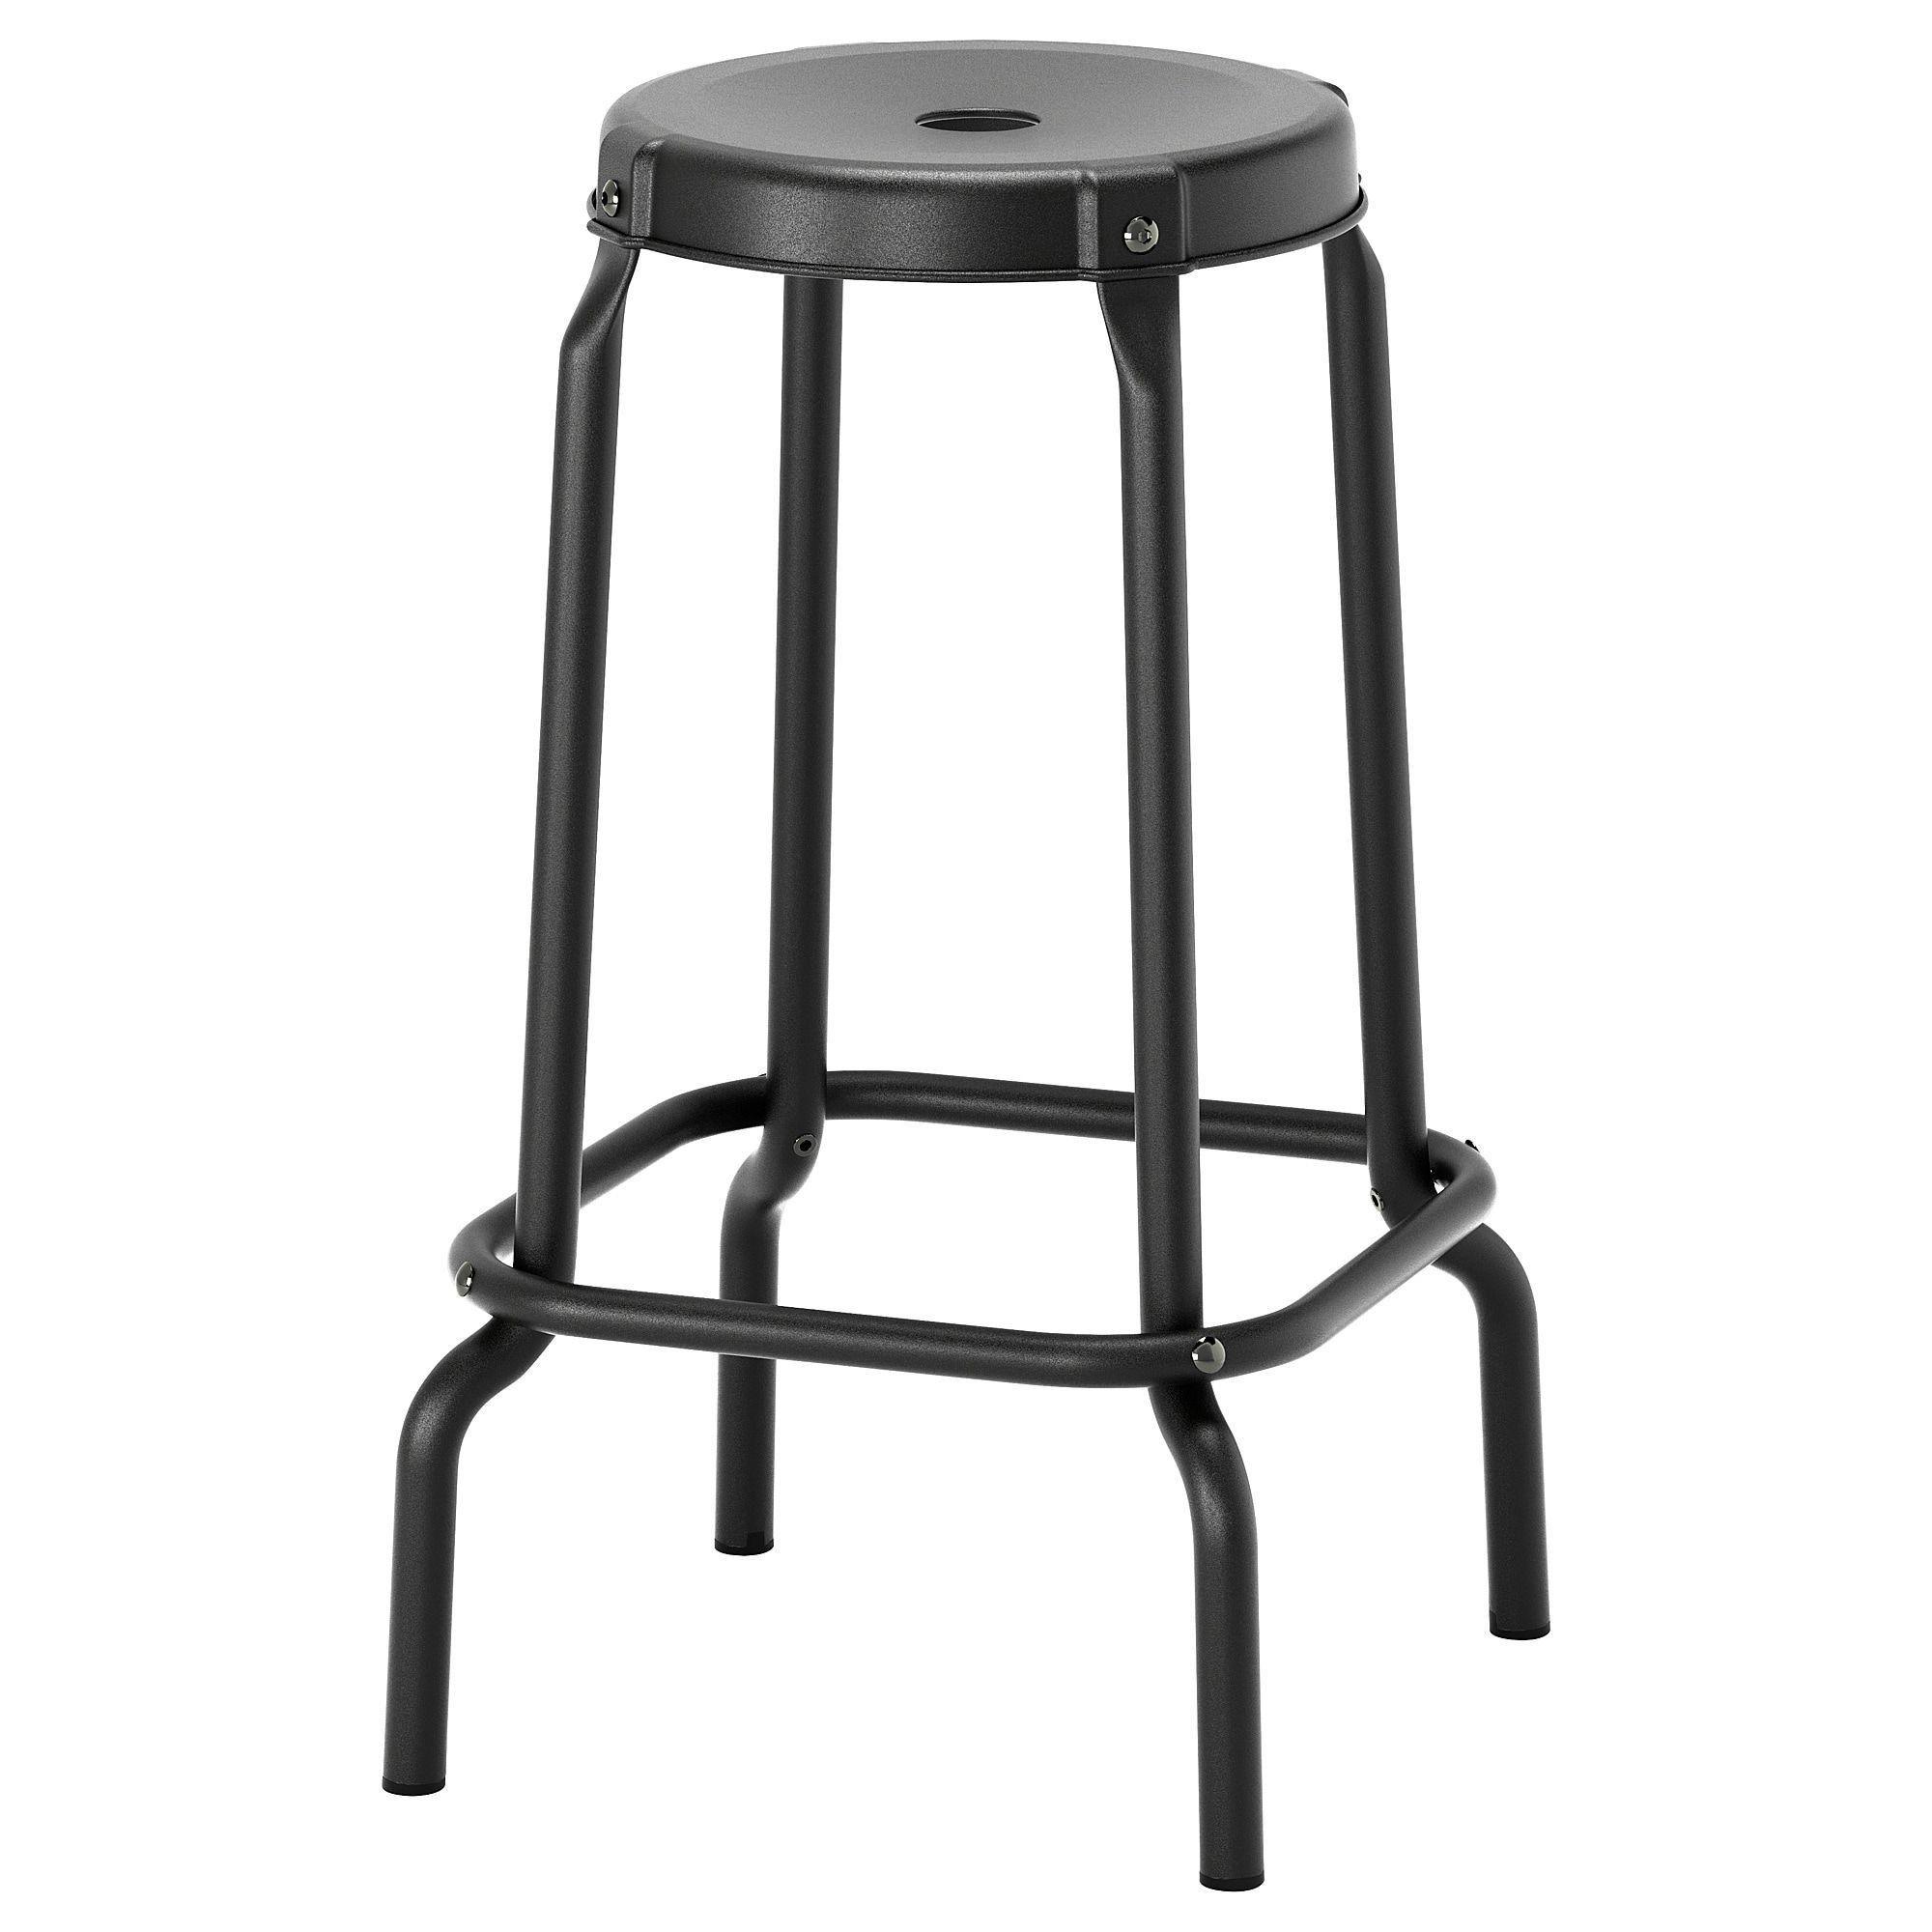 Raskog Bar Stool Black 24 3 4 Ikea Barstools Ikea Raskog